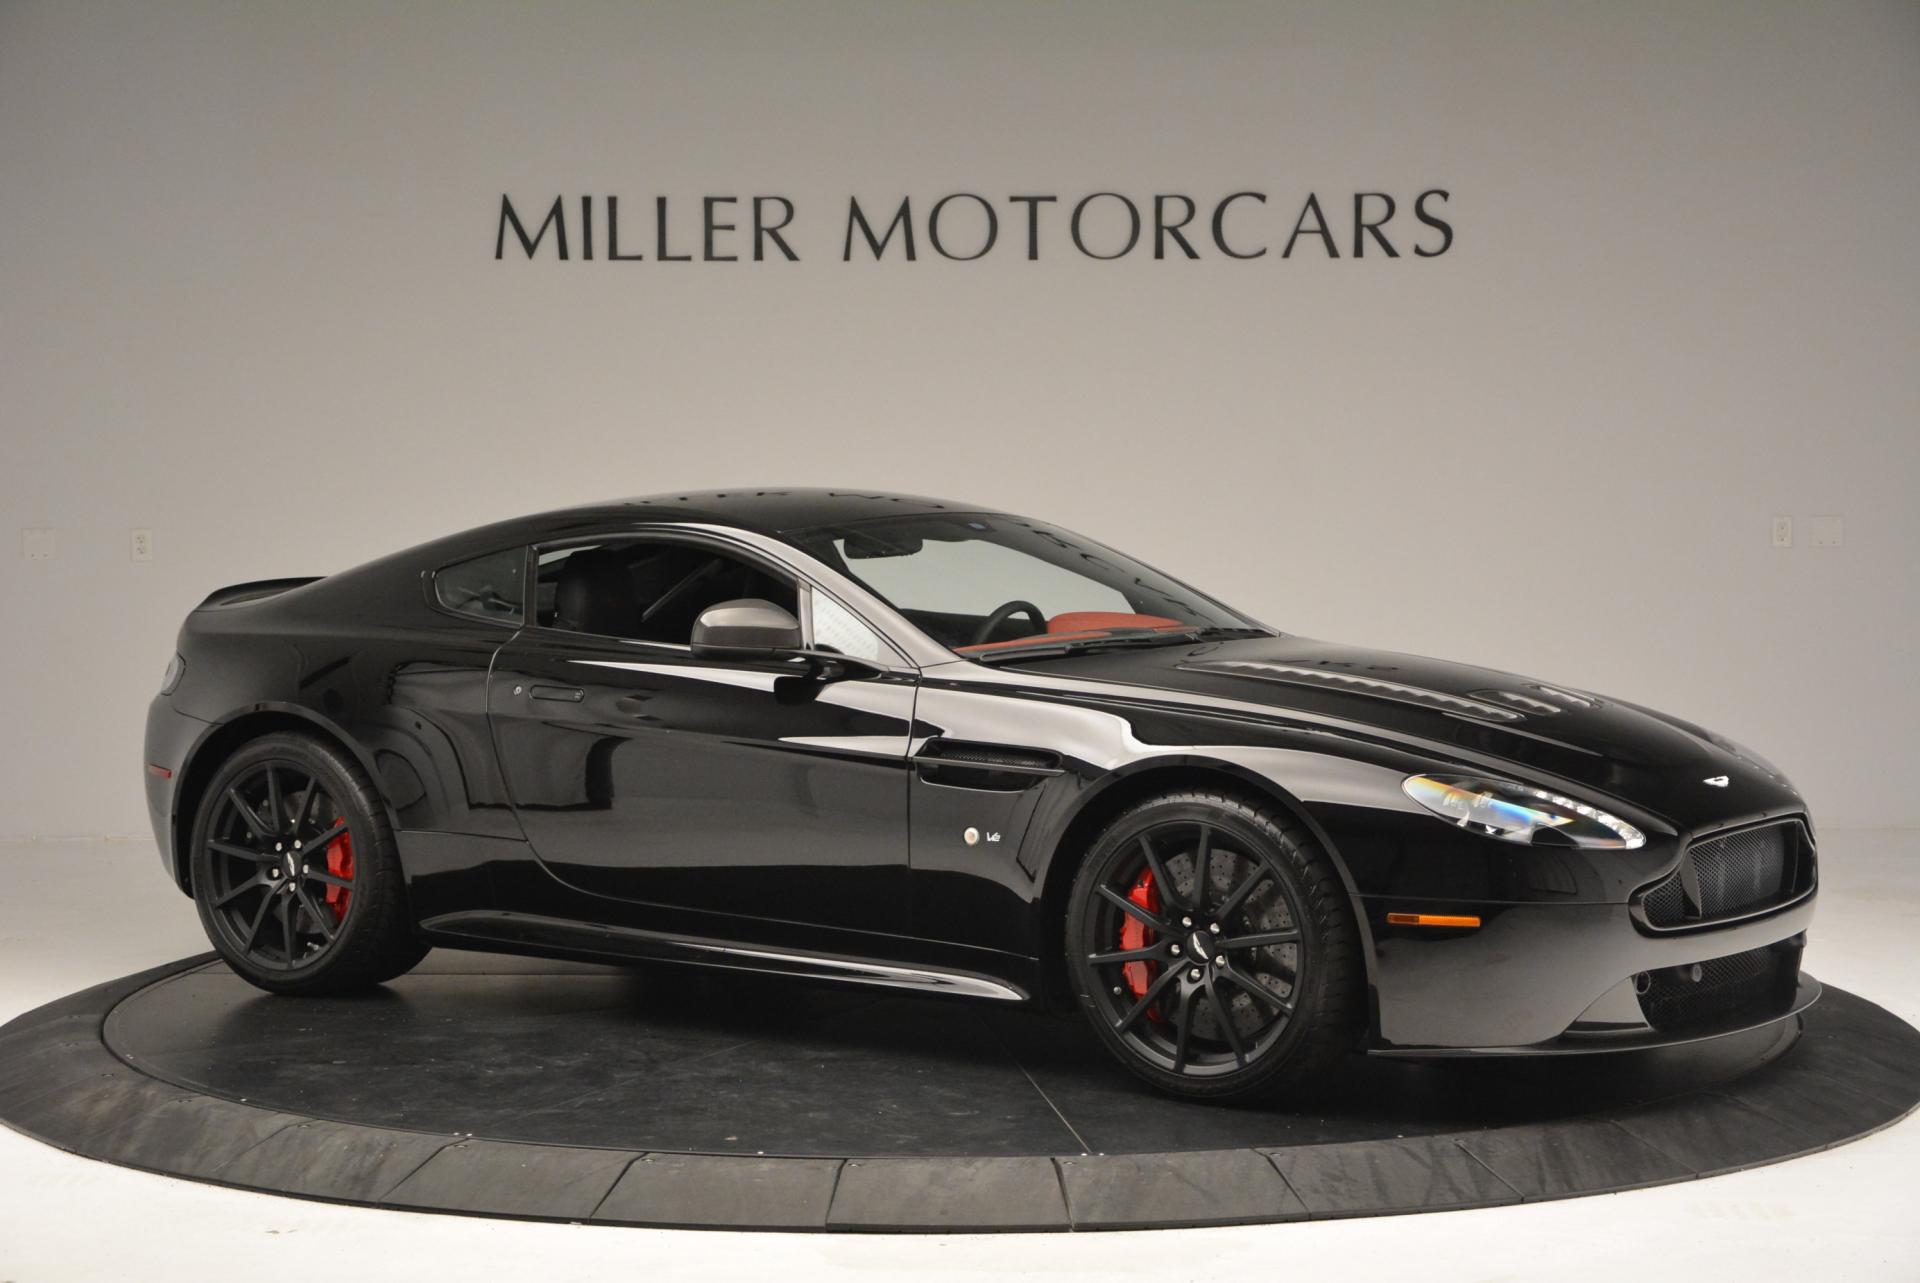 New 2015 Aston Martin V12 Vantage S For Sale Miller Motorcars Stock A1154